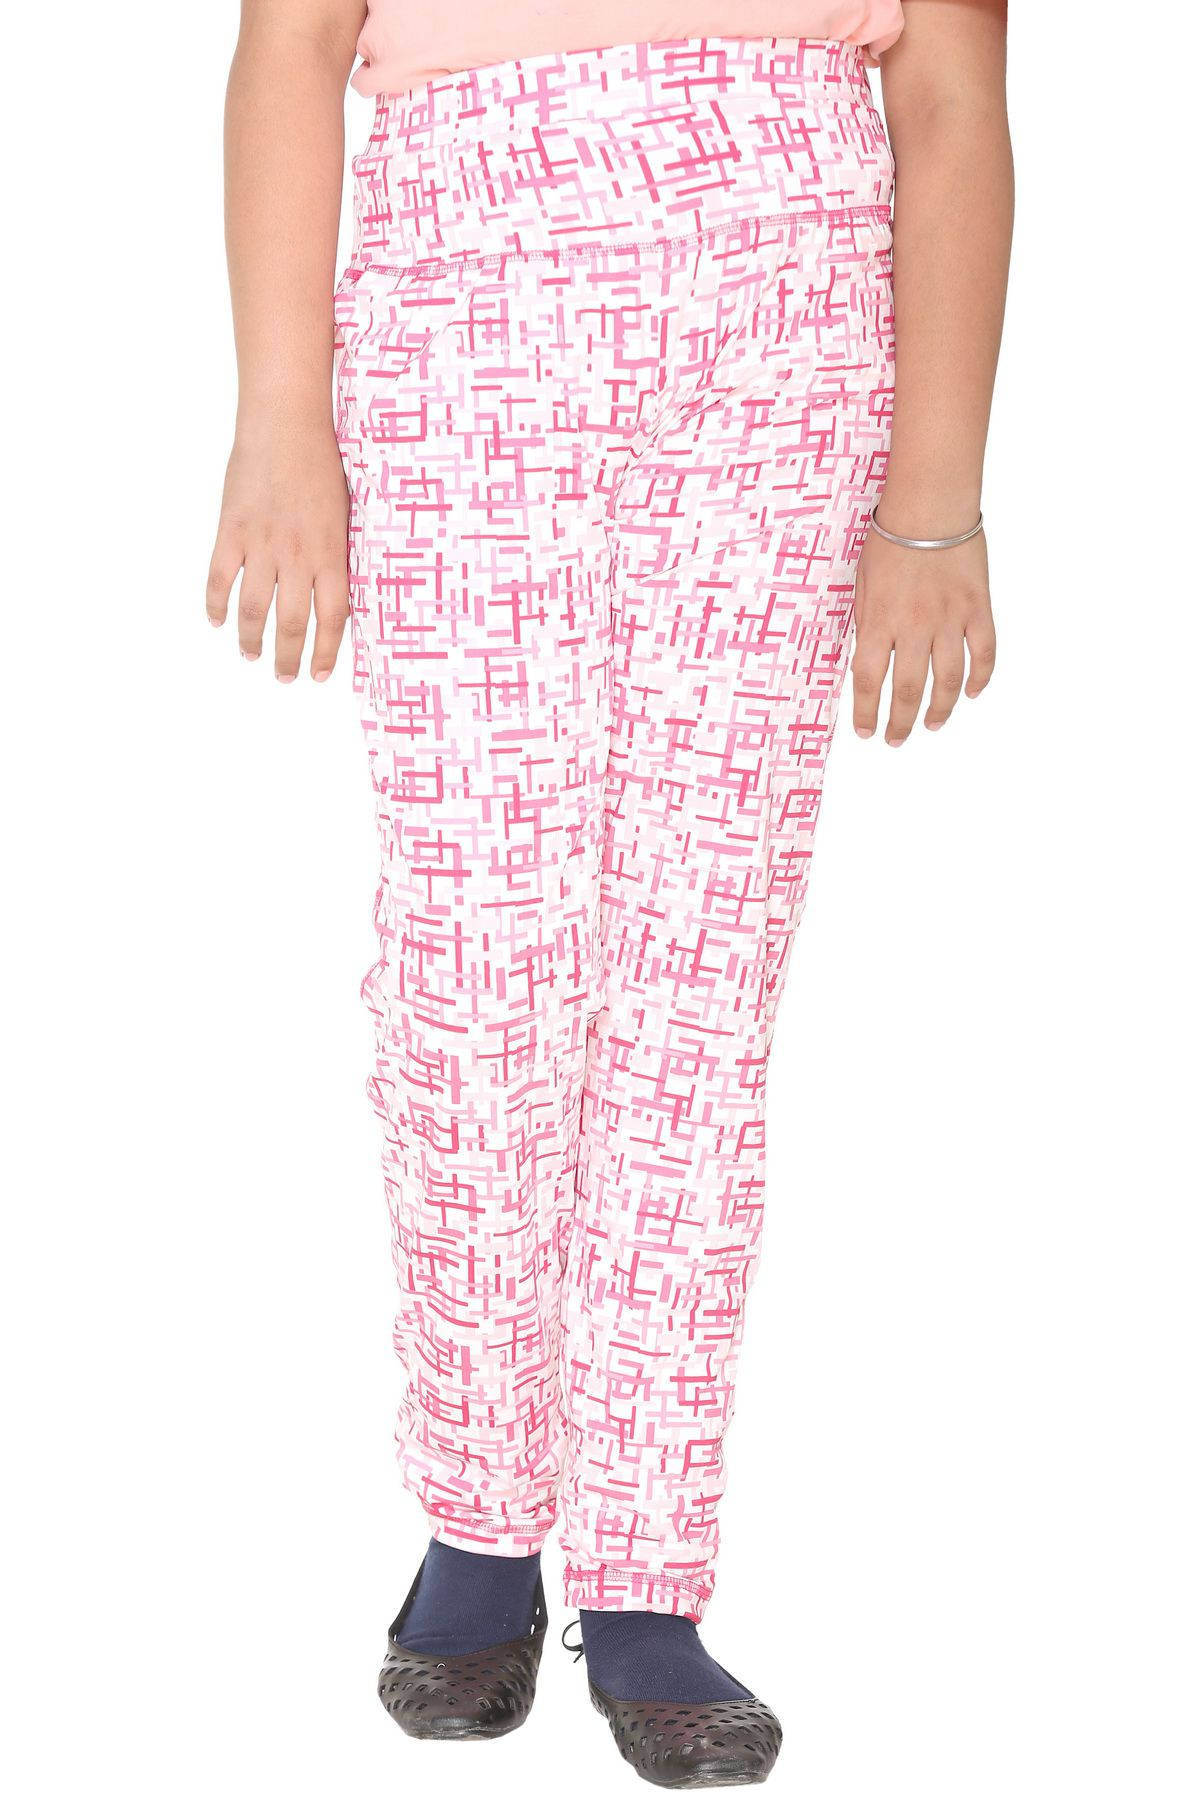 Bana Clothing Girls Pink Crepe Pyjamas